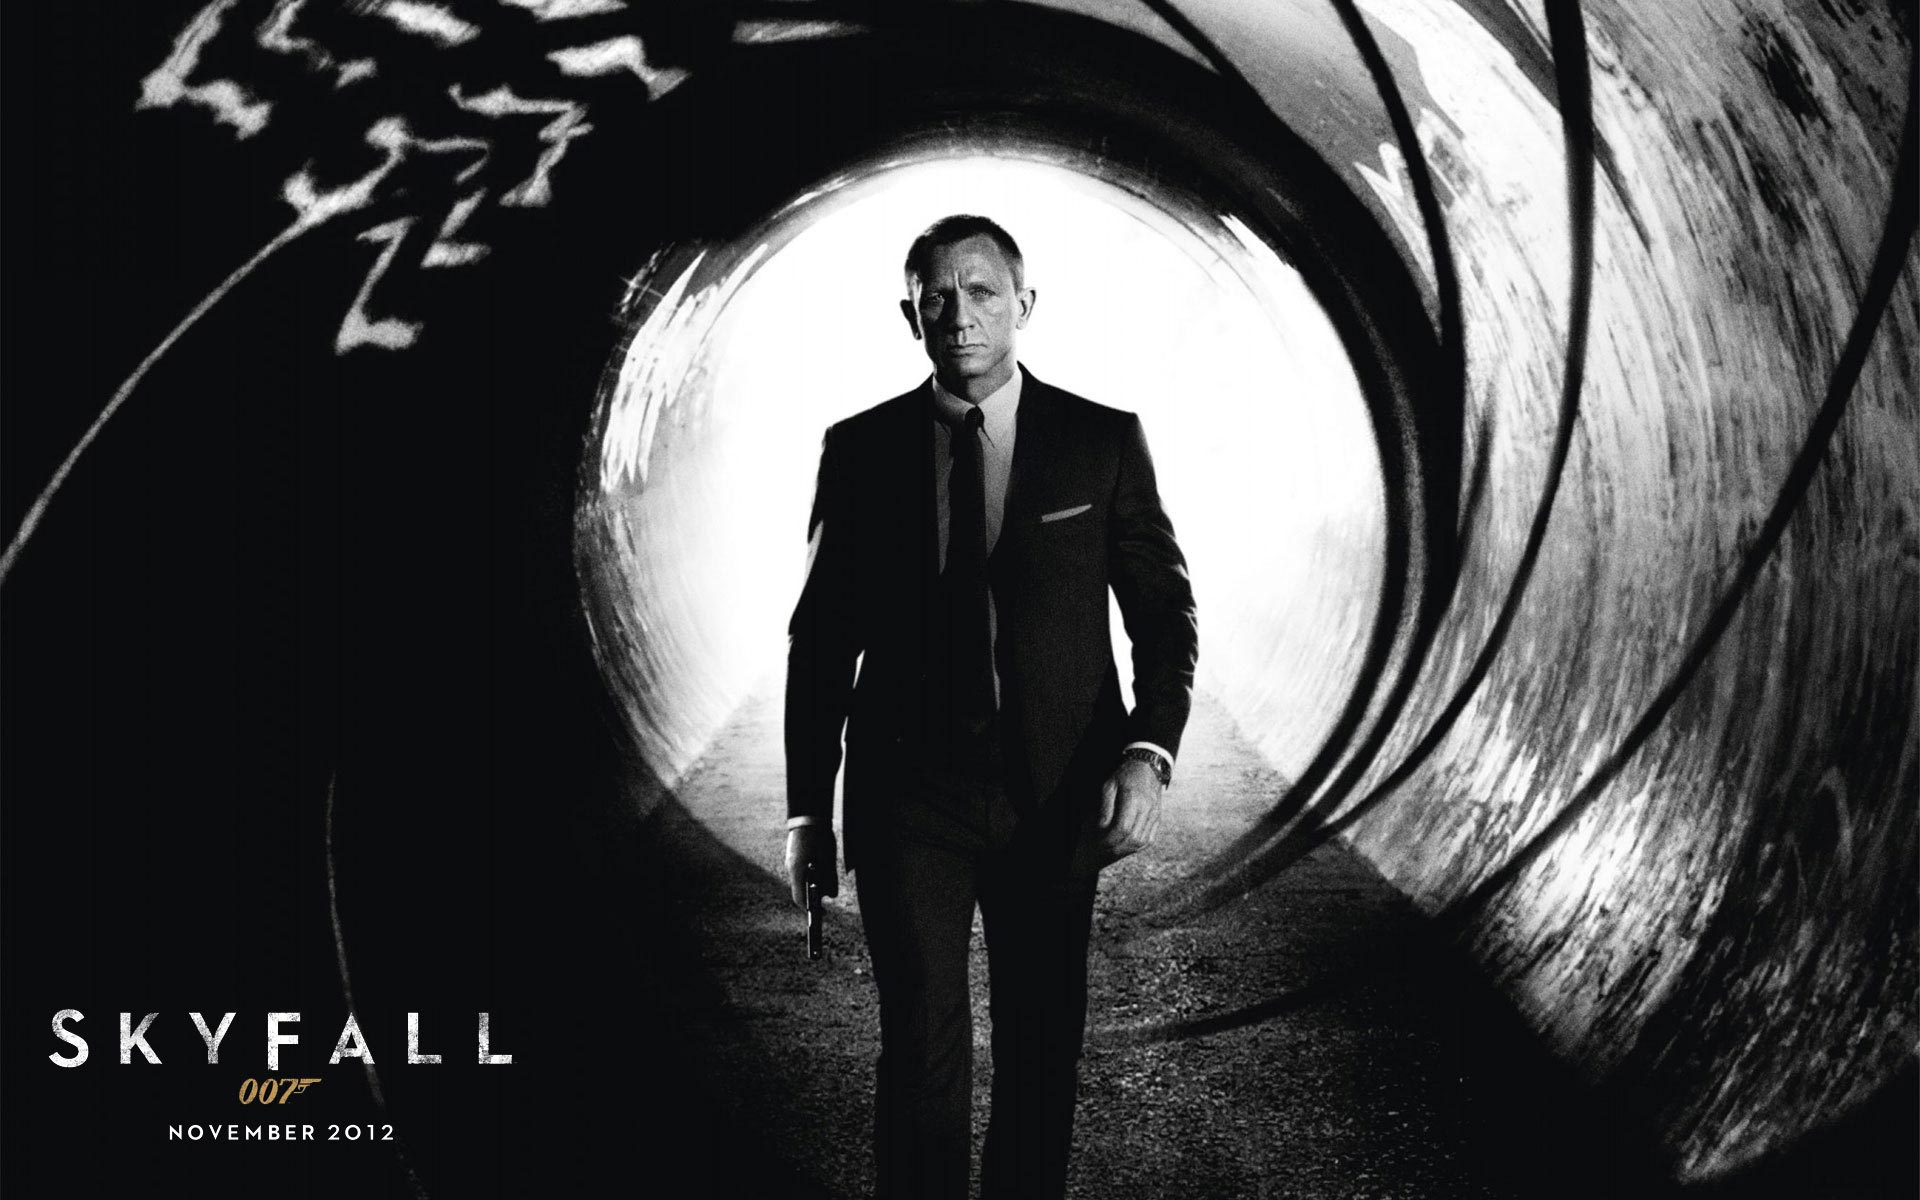 James Bond 007 Skyfall wallpaper 11